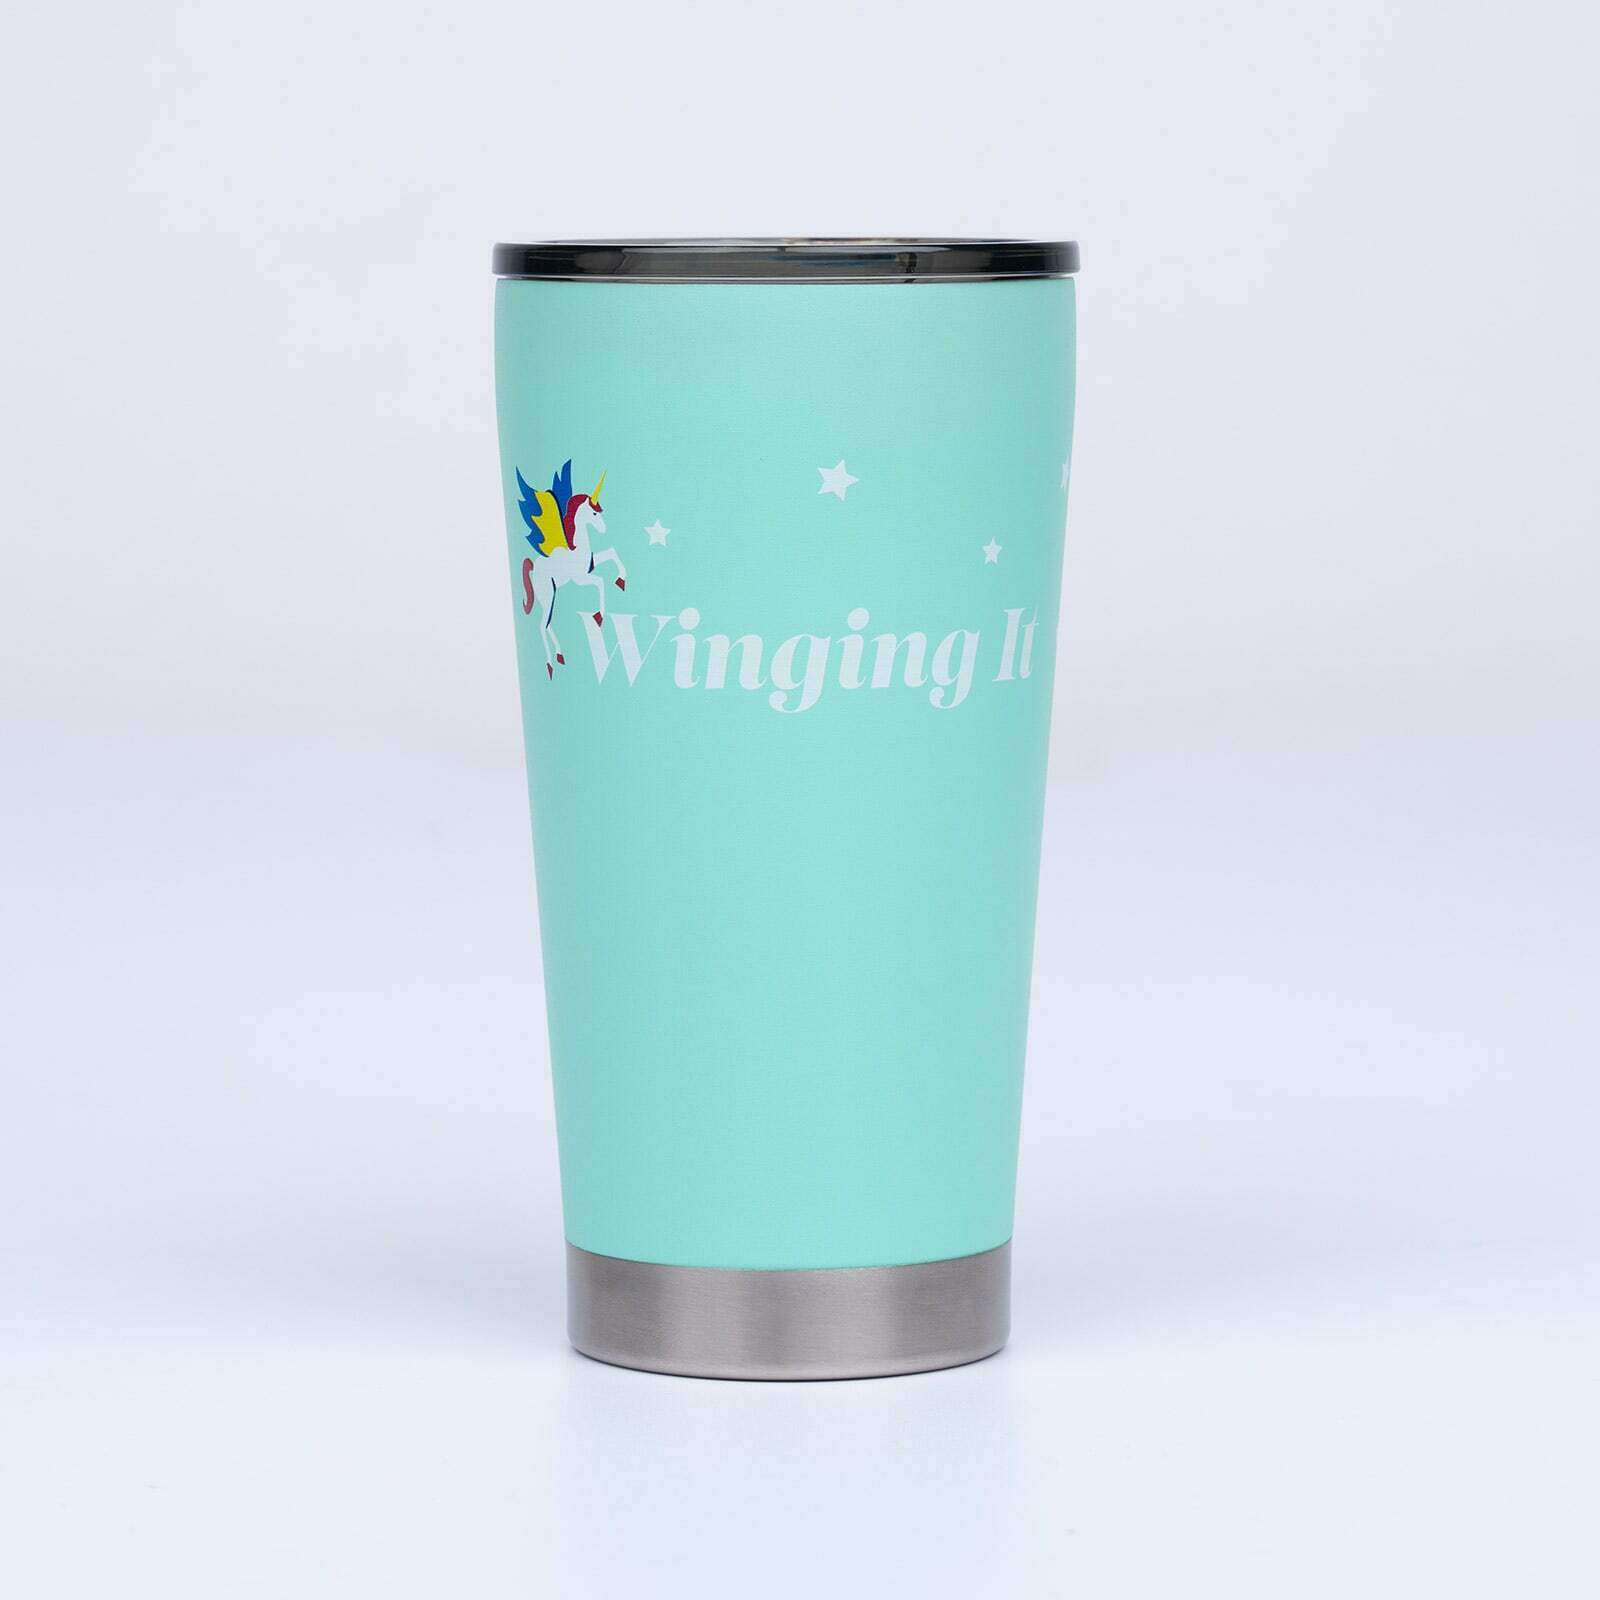 Winging It - Unicorn Coffee Tumbler - Unisexd in Blue